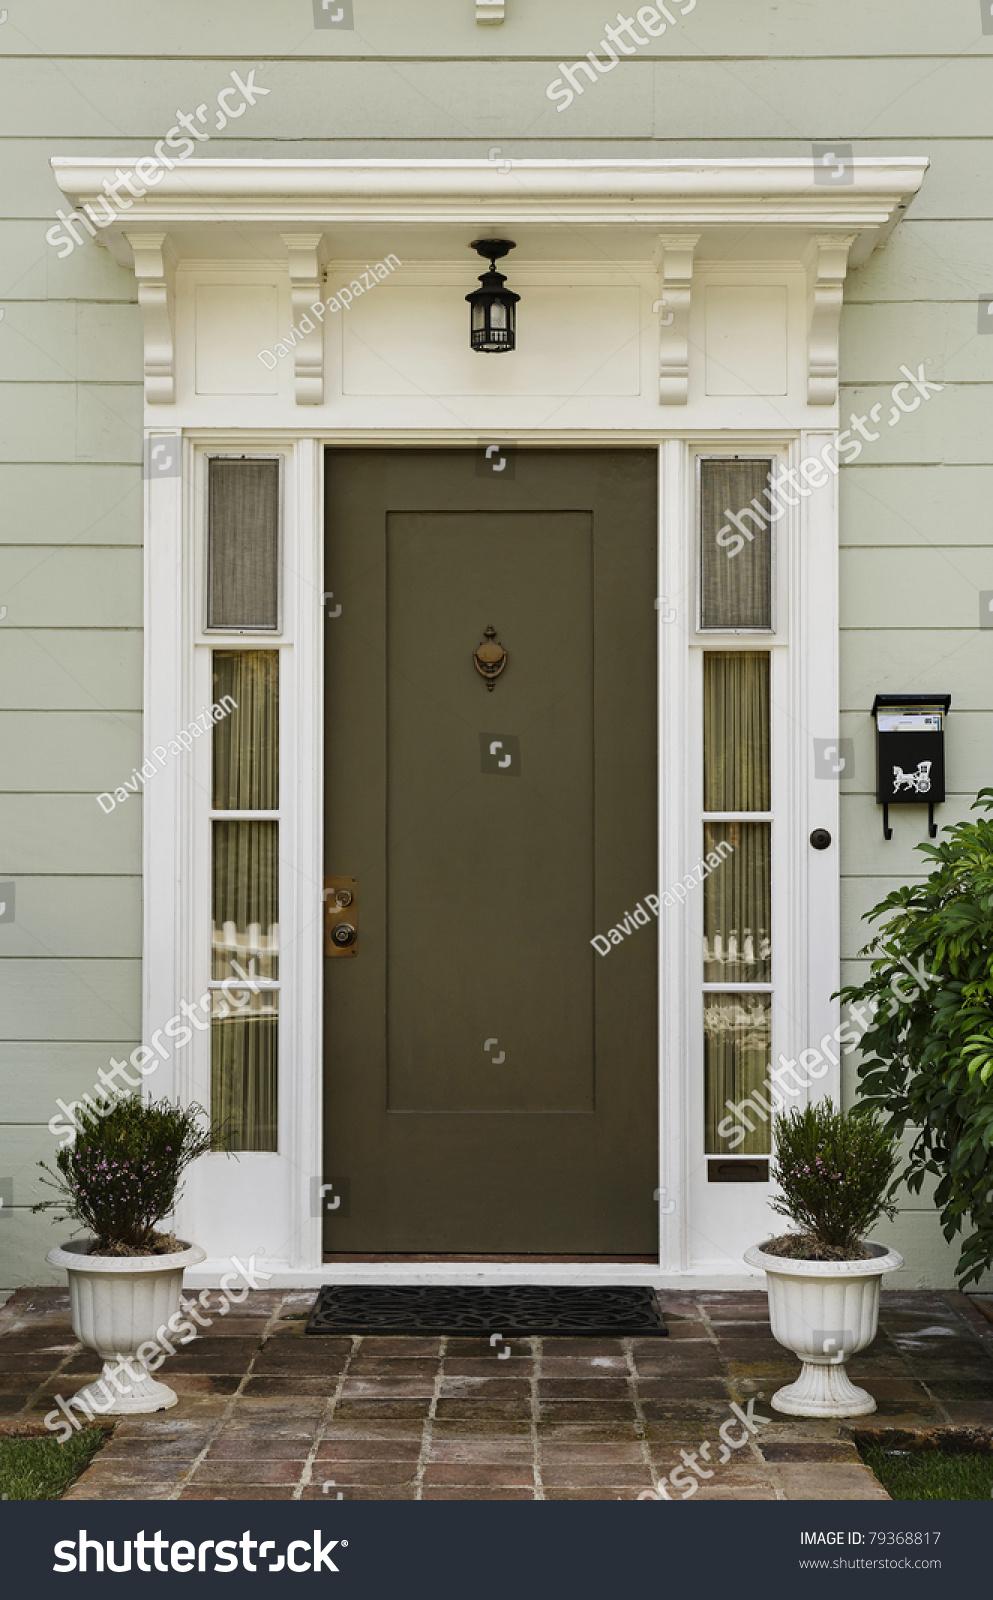 wooden front door home glass panels stock photo 79368817 shutterstock. Black Bedroom Furniture Sets. Home Design Ideas